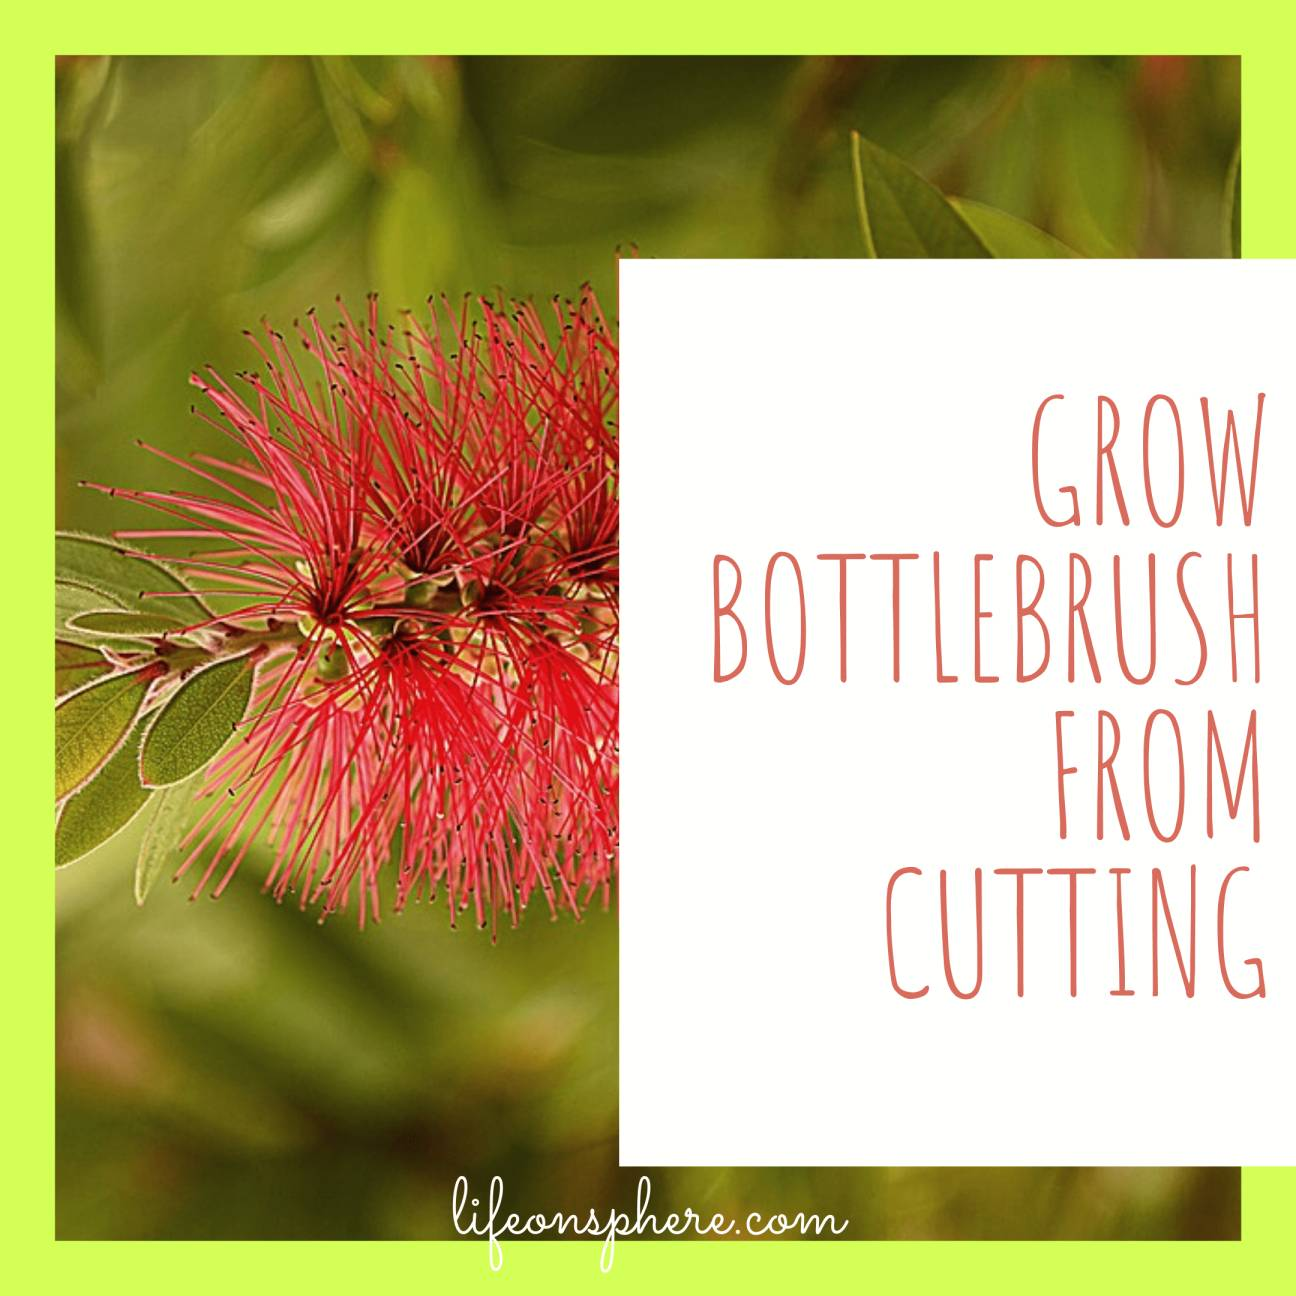 Growing bottlebrush from cutting